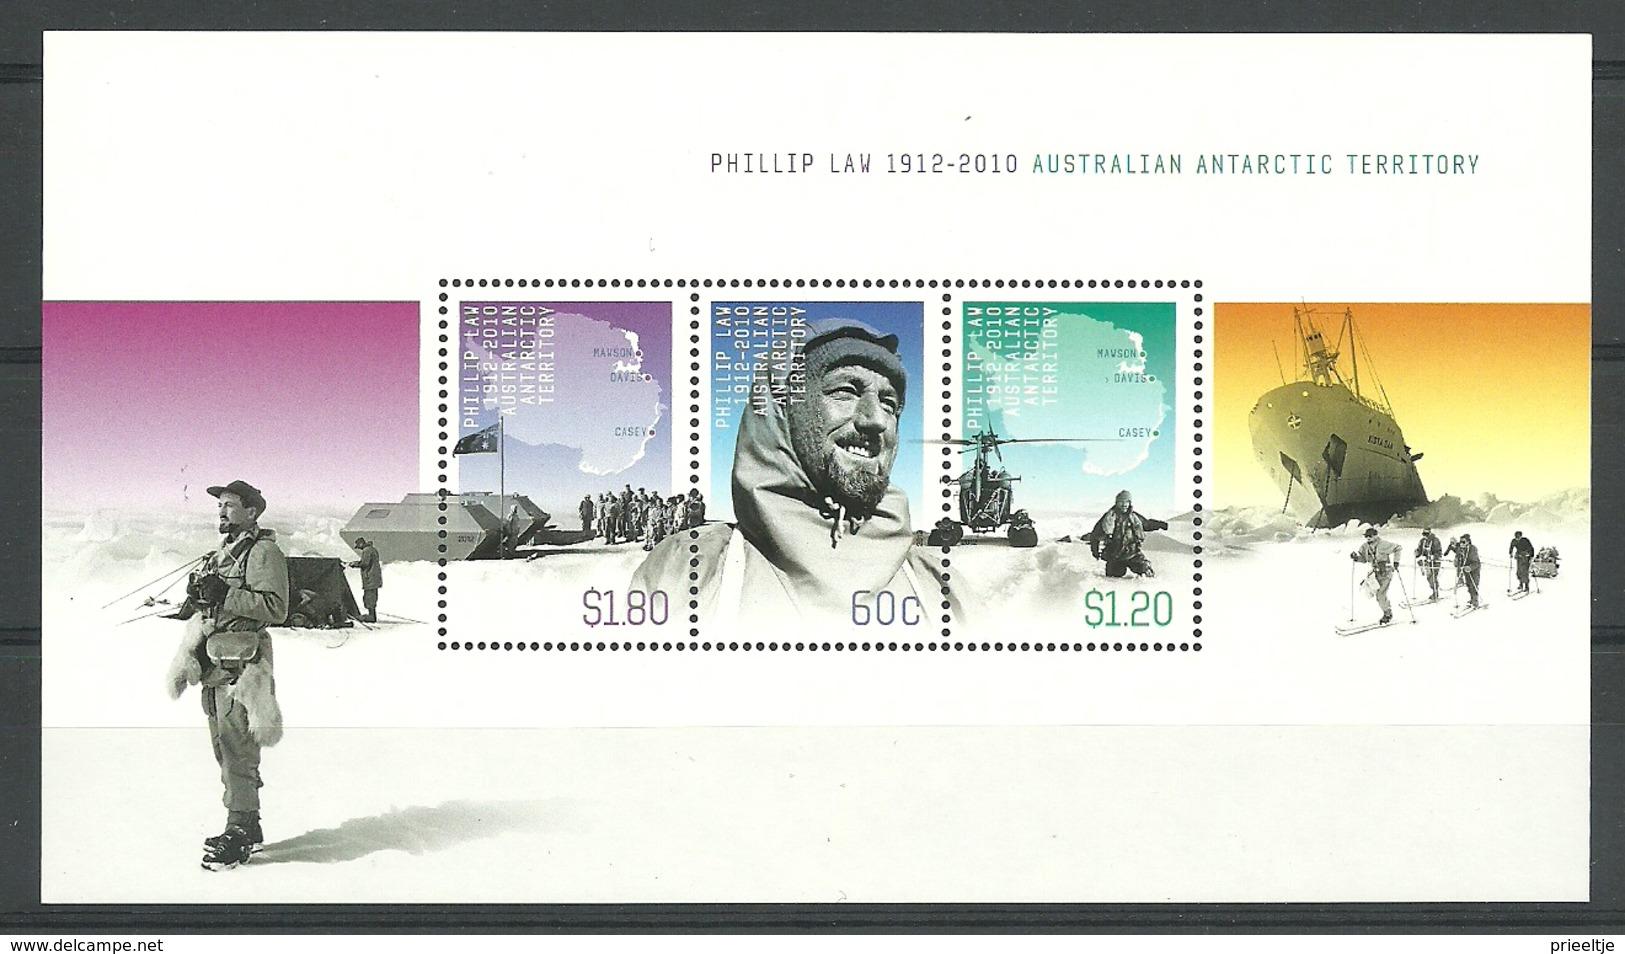 Australia AAT 2012 Phillip Law Centenary S/S Y.T. BF 10 ** - Australisches Antarktis-Territorium (AAT)